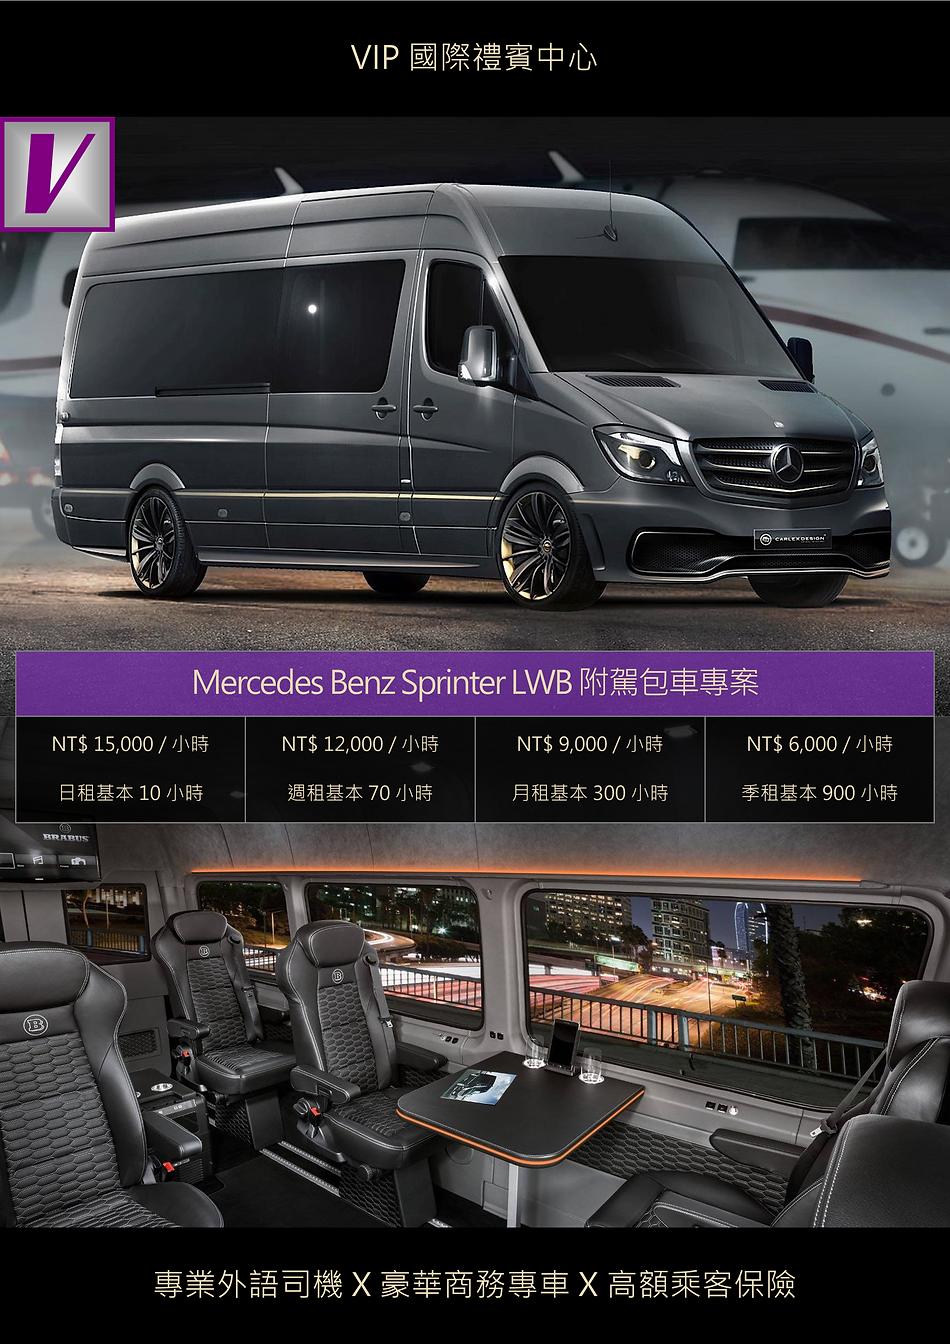 VIP國際禮賓中心 MERCEDES BENZ SPRINTER LWB 附駕包車專案 DM.png